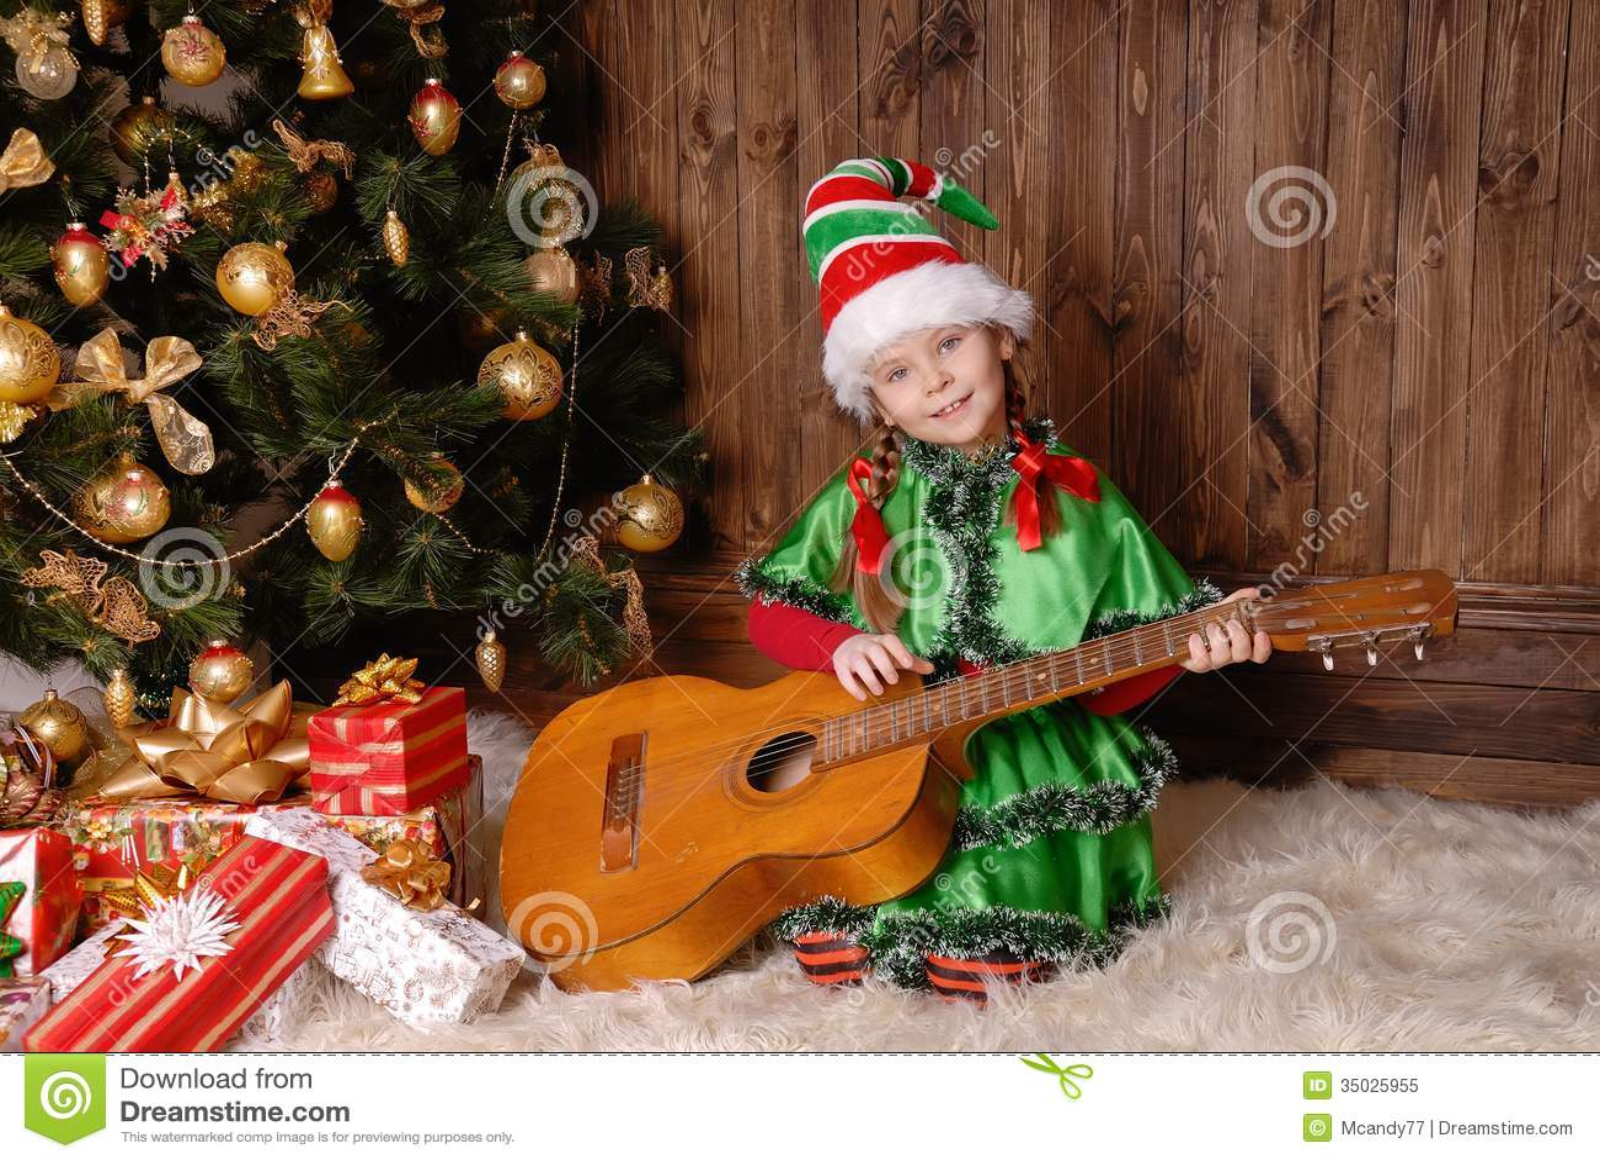 free christmas guitar sheet music